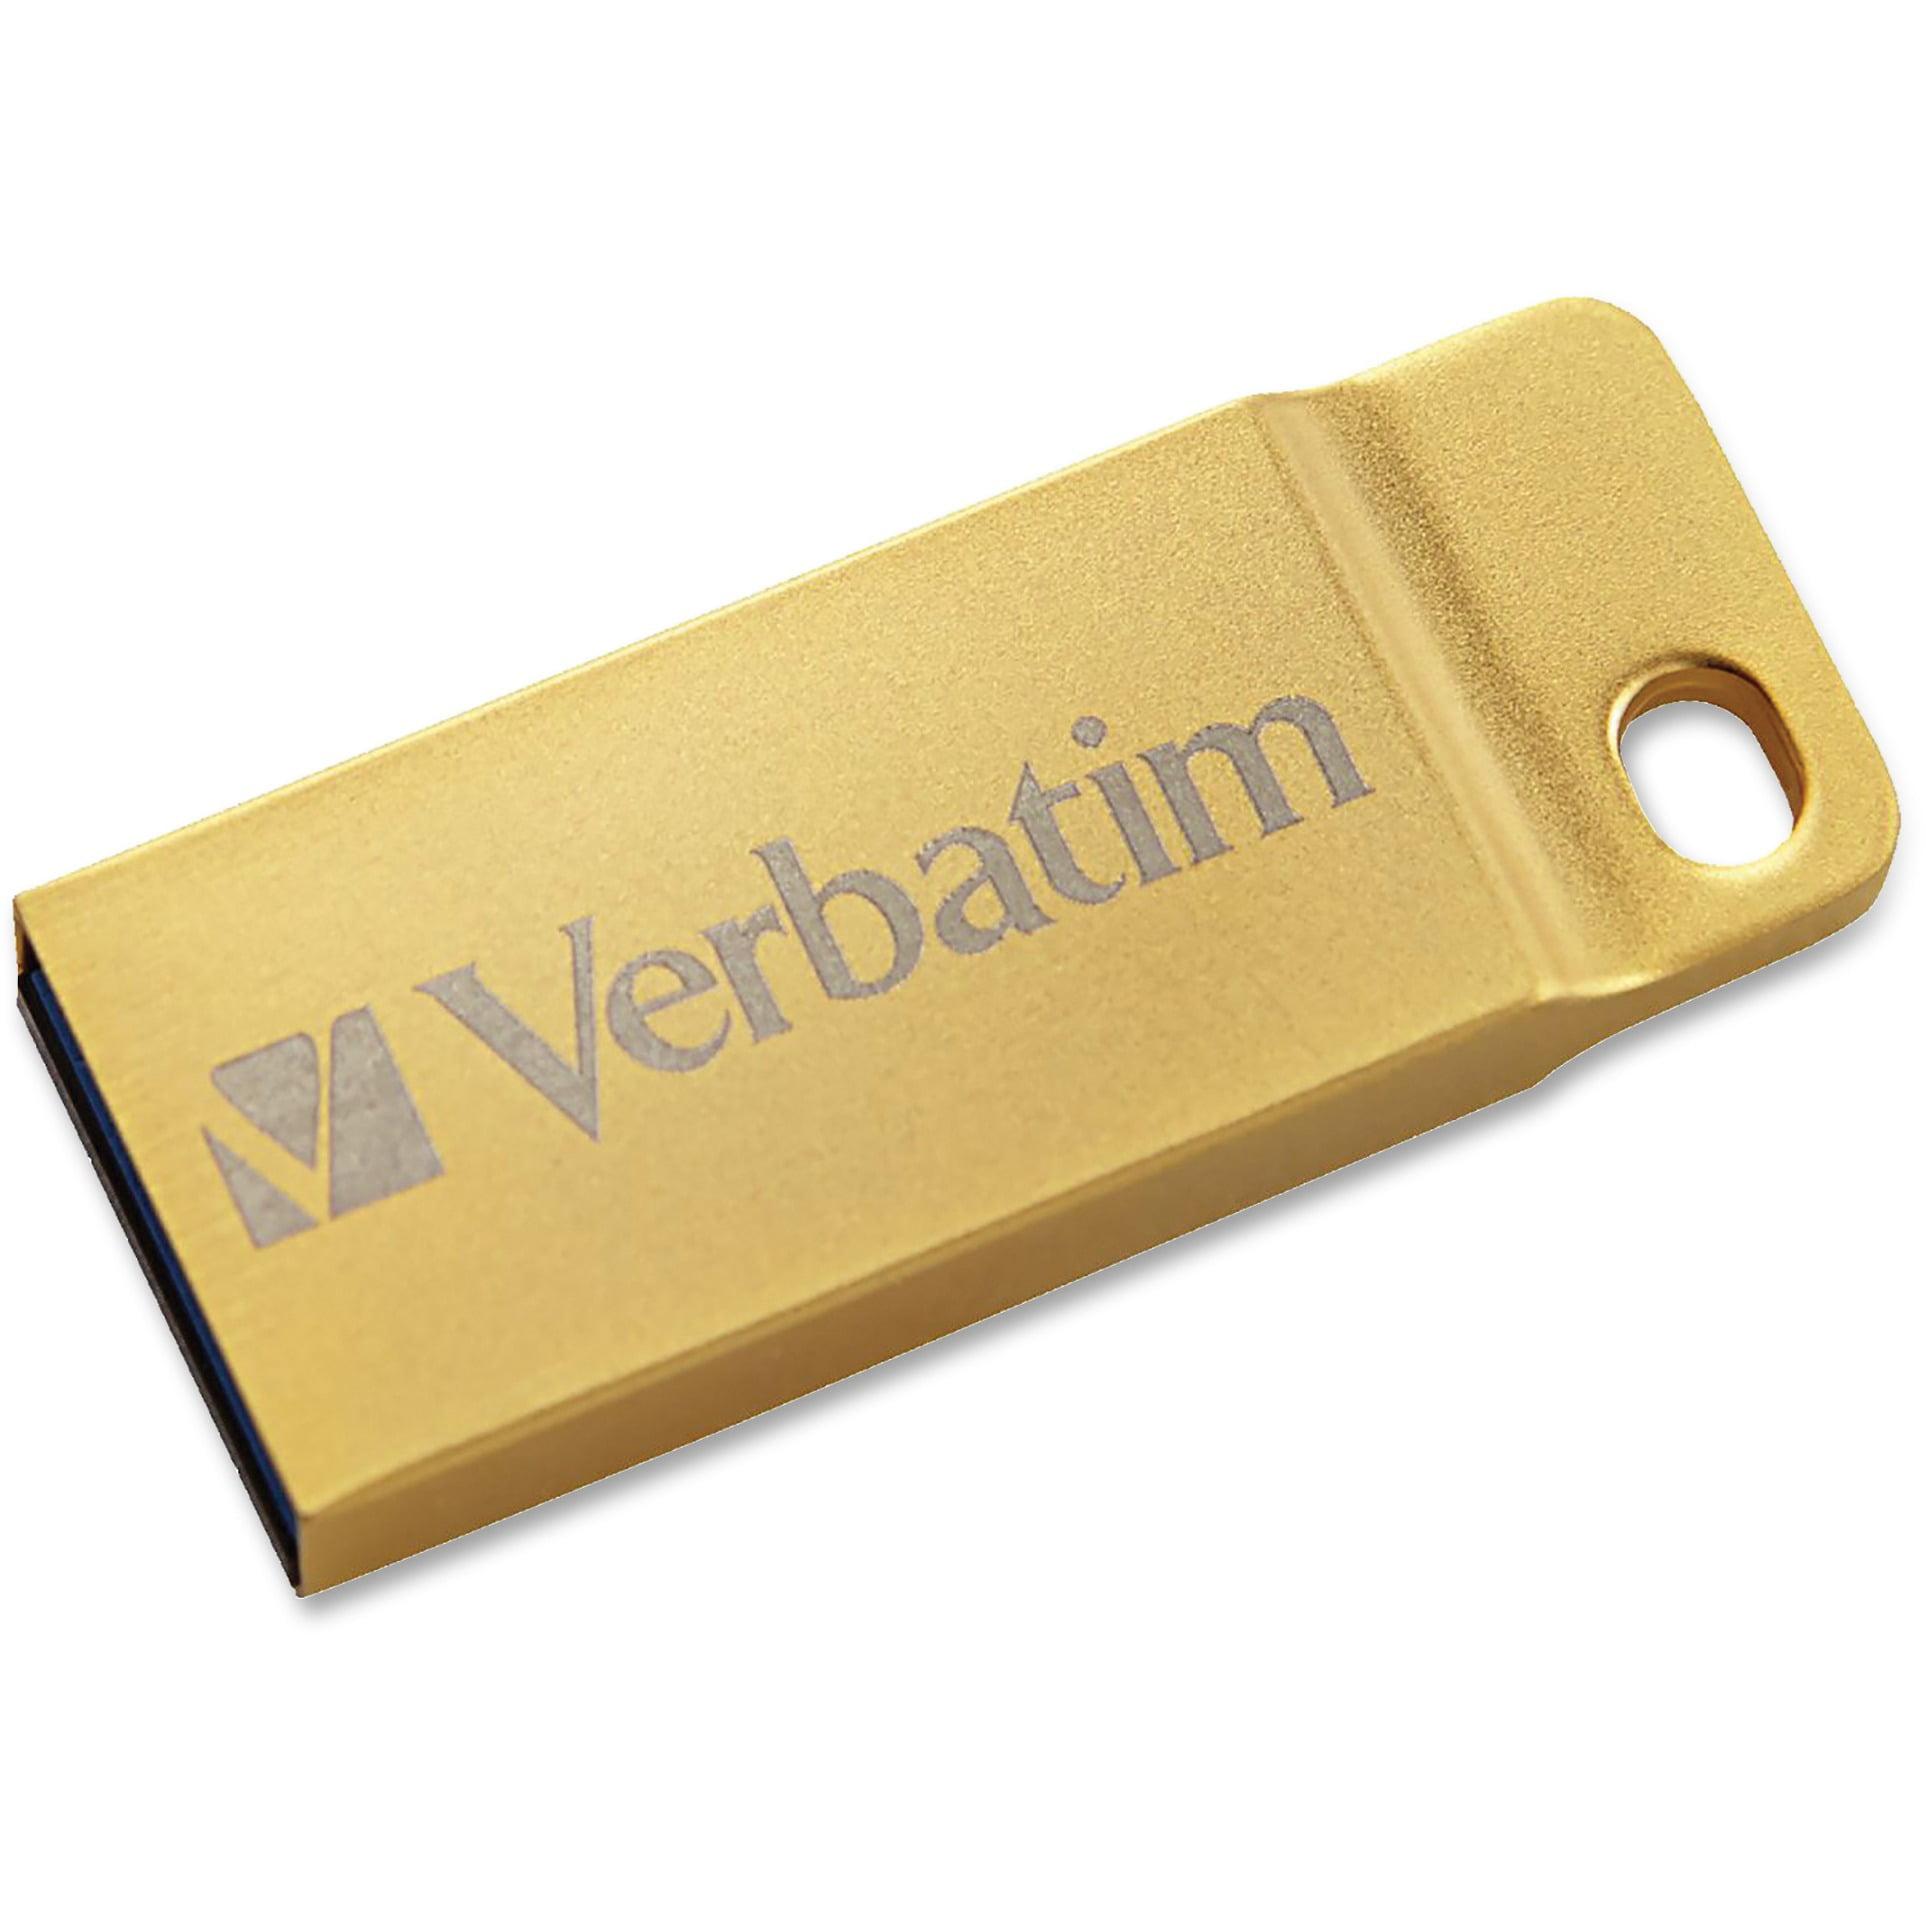 Verbatim, VER99106, Metal Executive USB 3.0 Flash Drive, 1 / Each, Gold